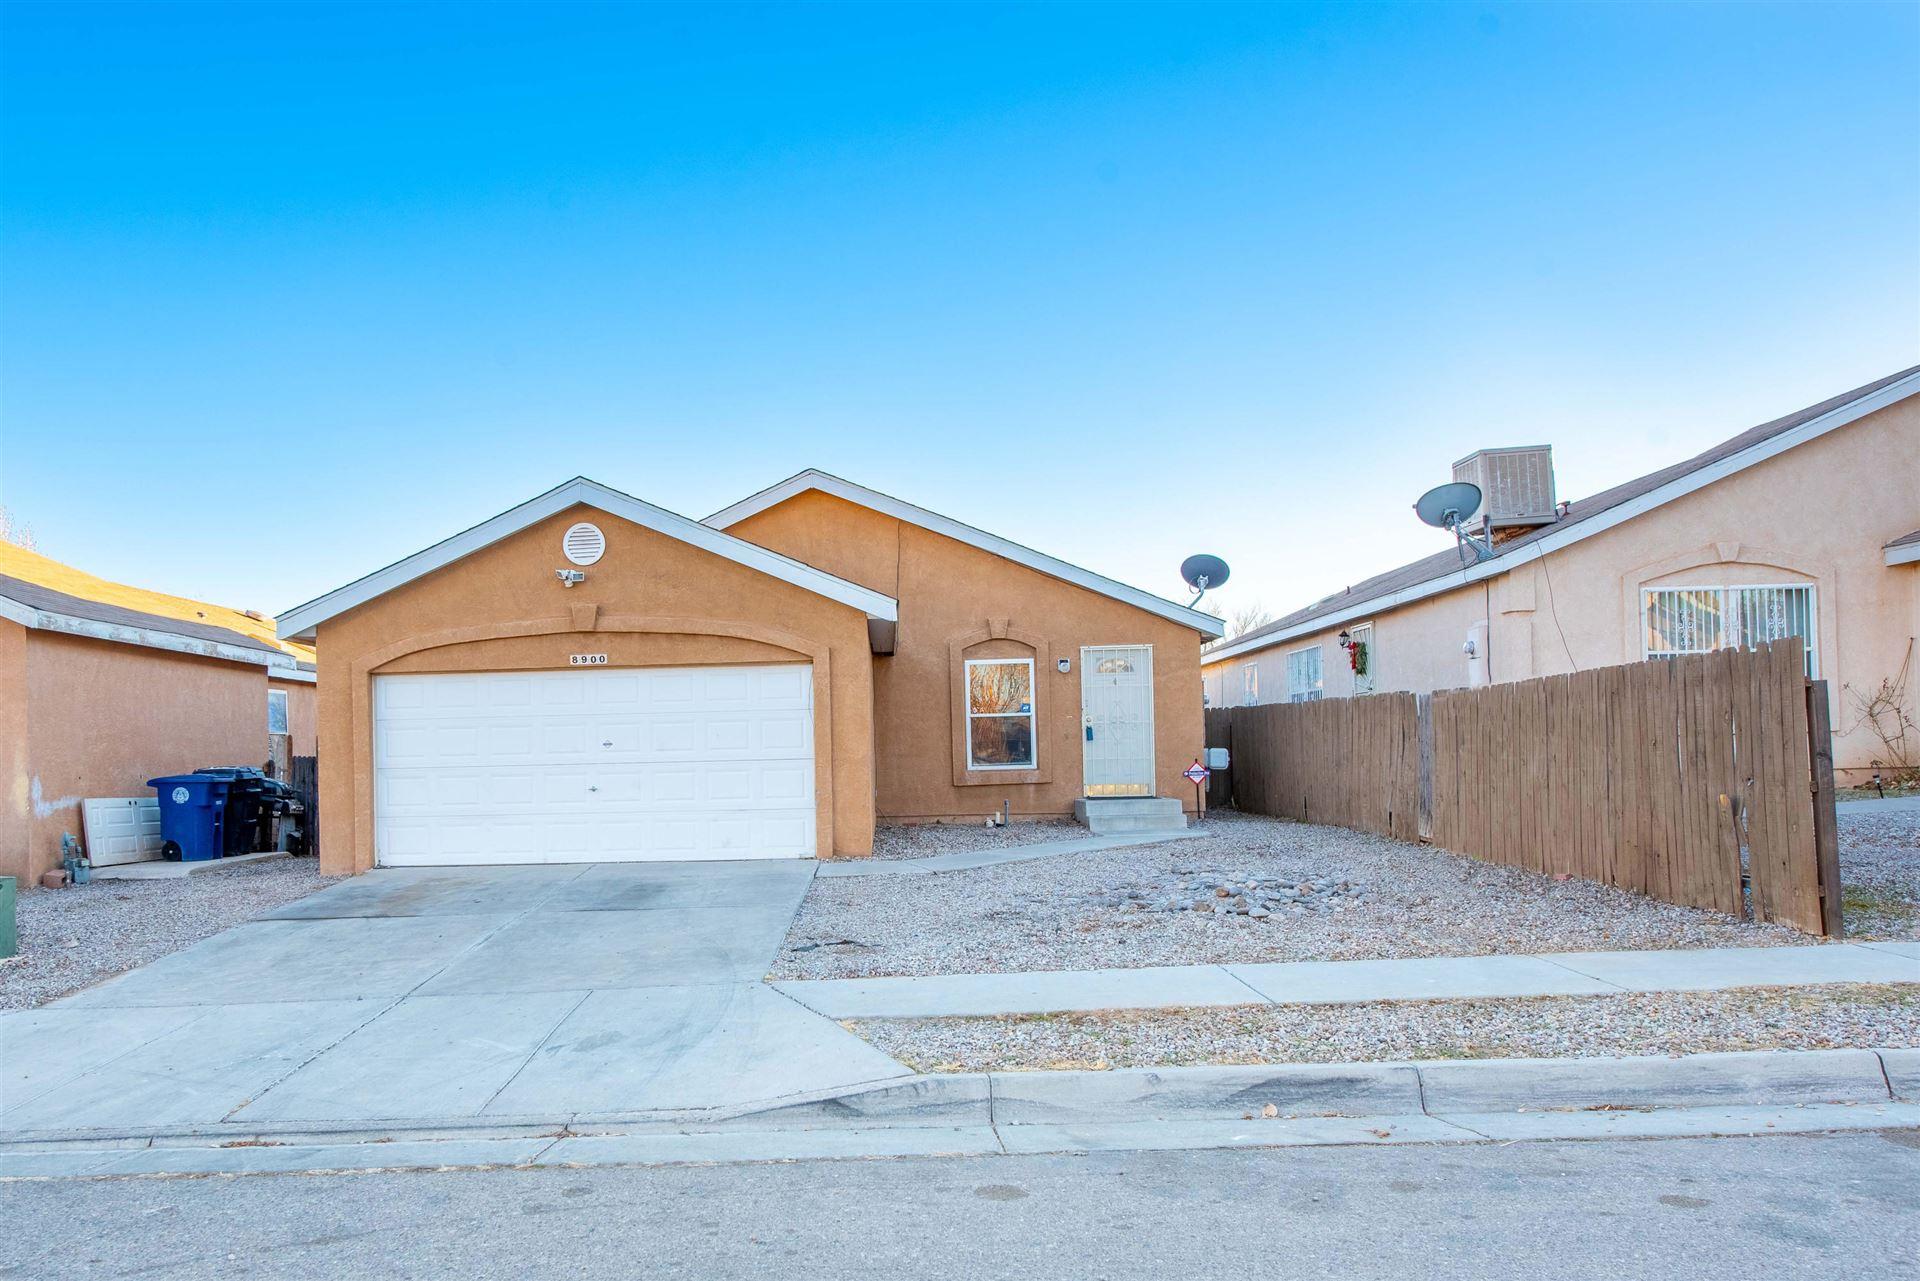 8900 ODIN Road SW, Albuquerque, NM 87121 - MLS#: 985675